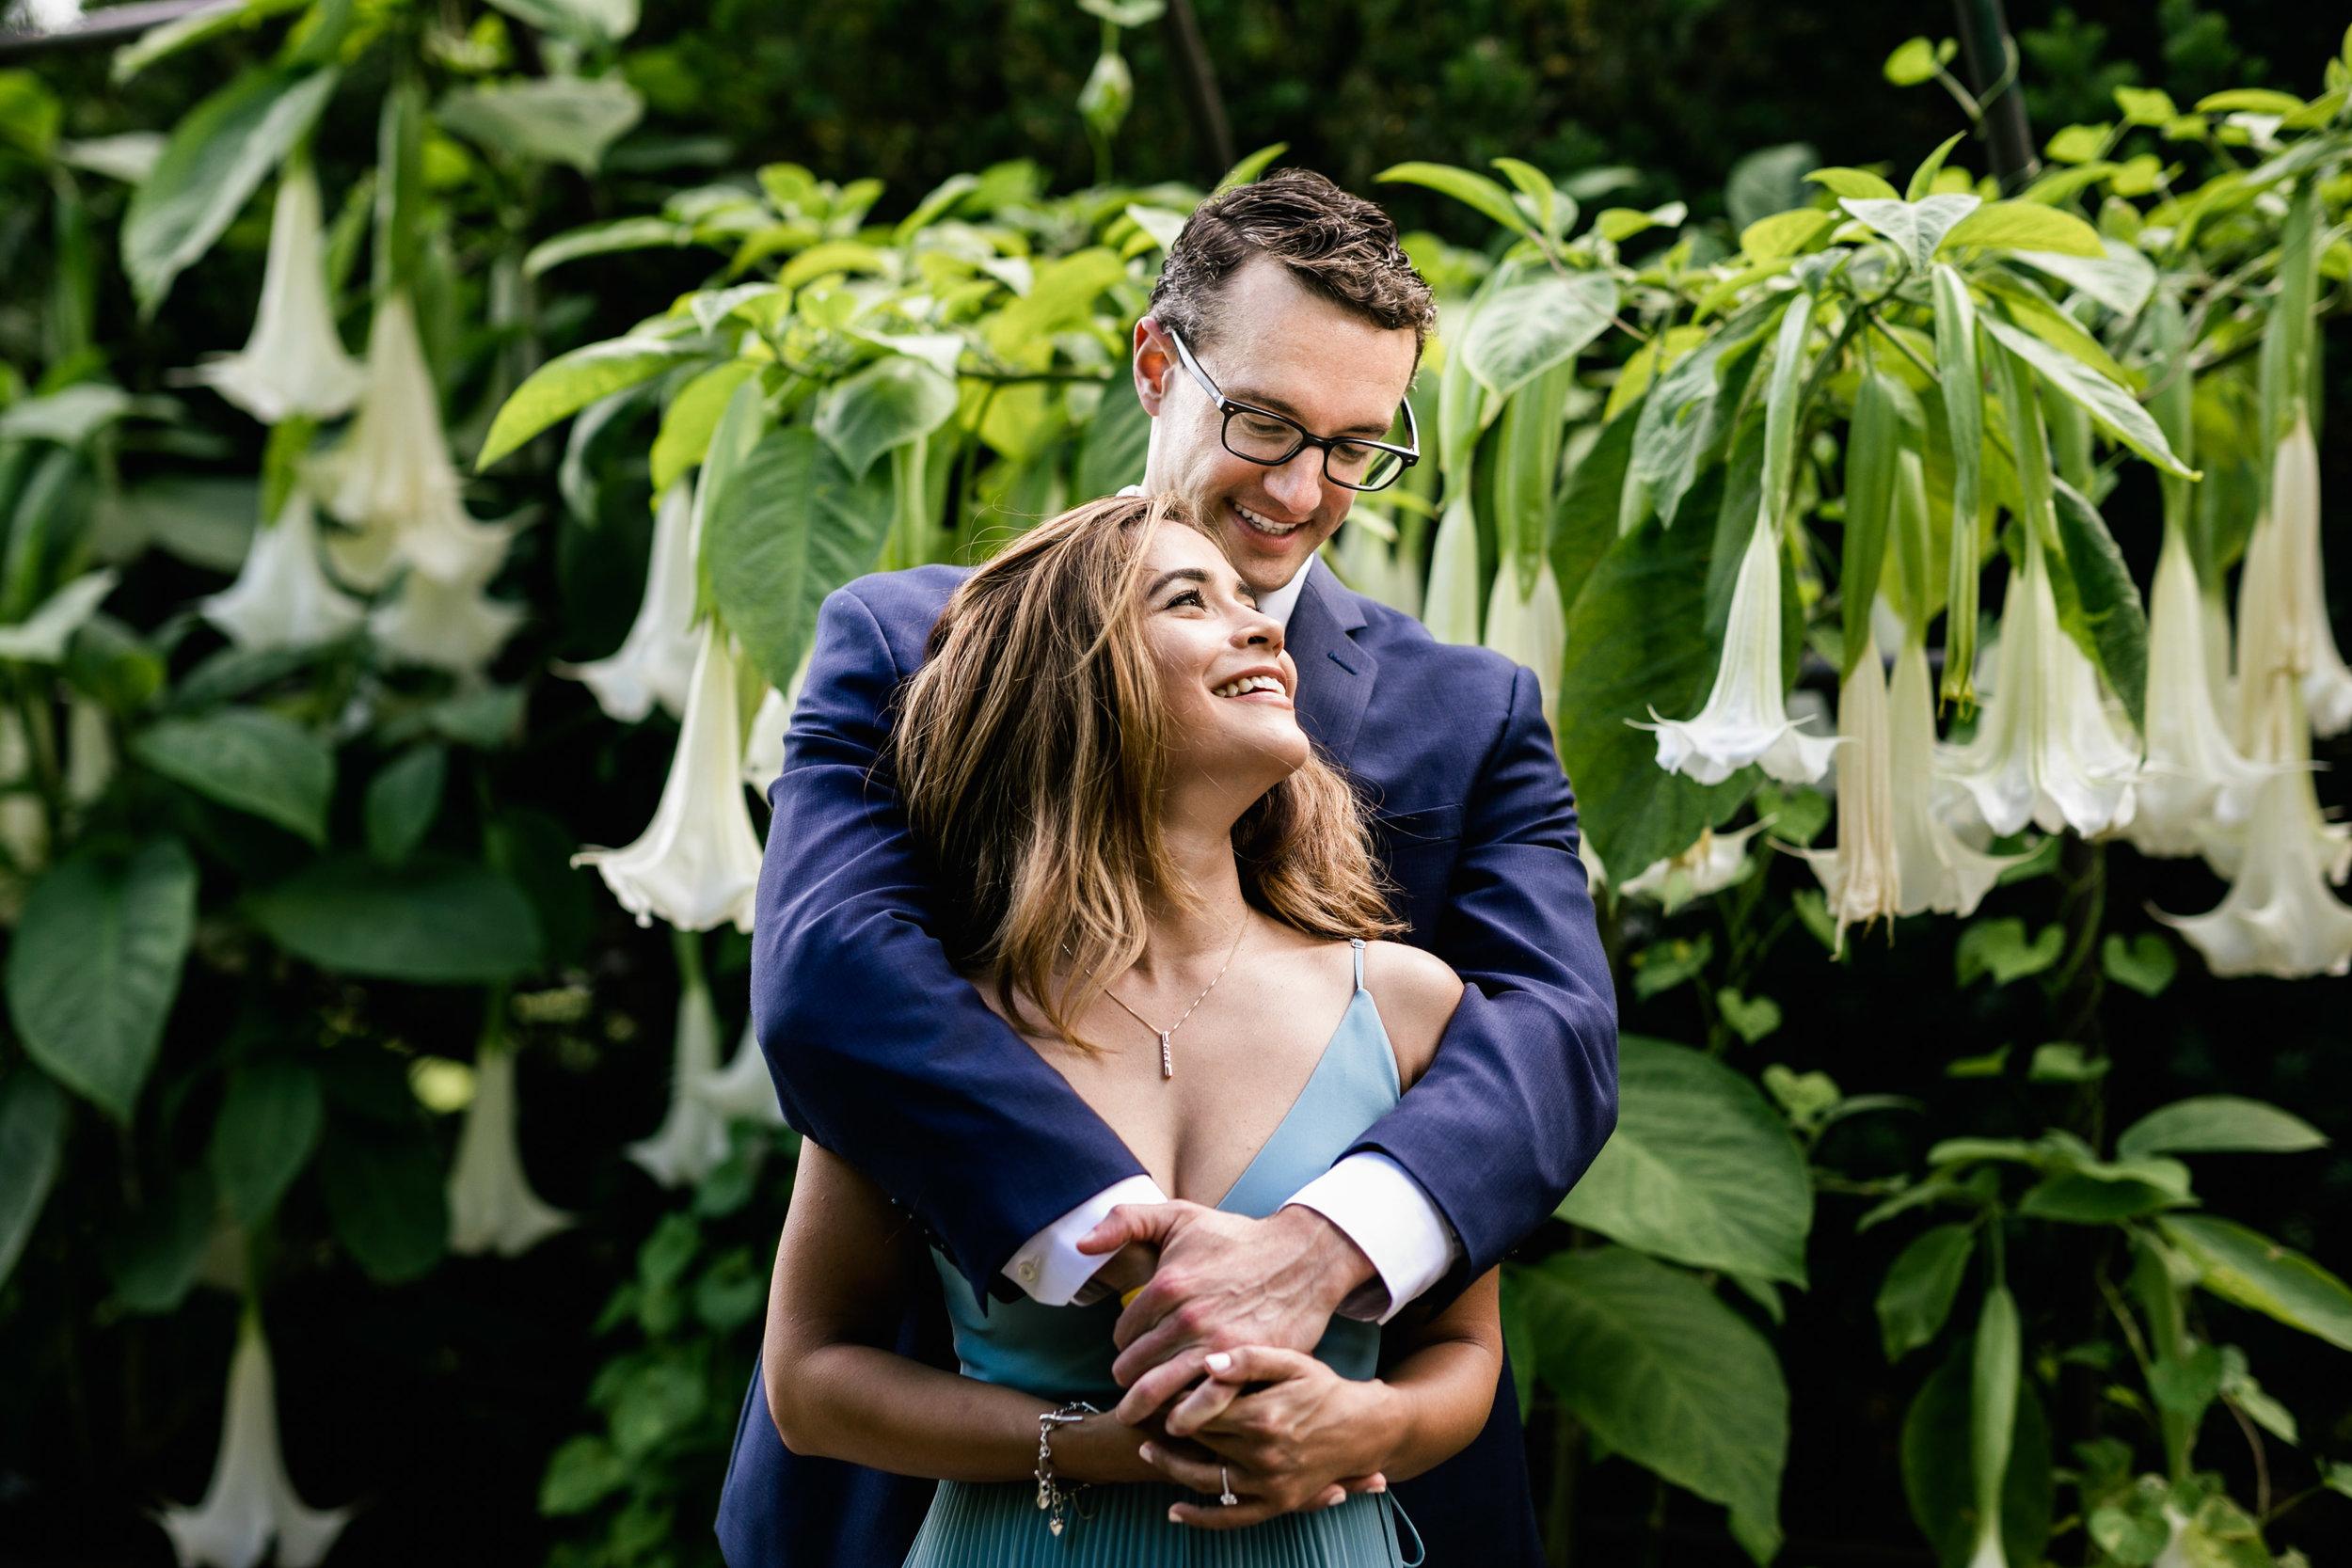 photography-natural-candid-engaged-proposal-philadelphia-wedding-longwood gardends-nature-flowers-modern-lifestyle-05.JPG